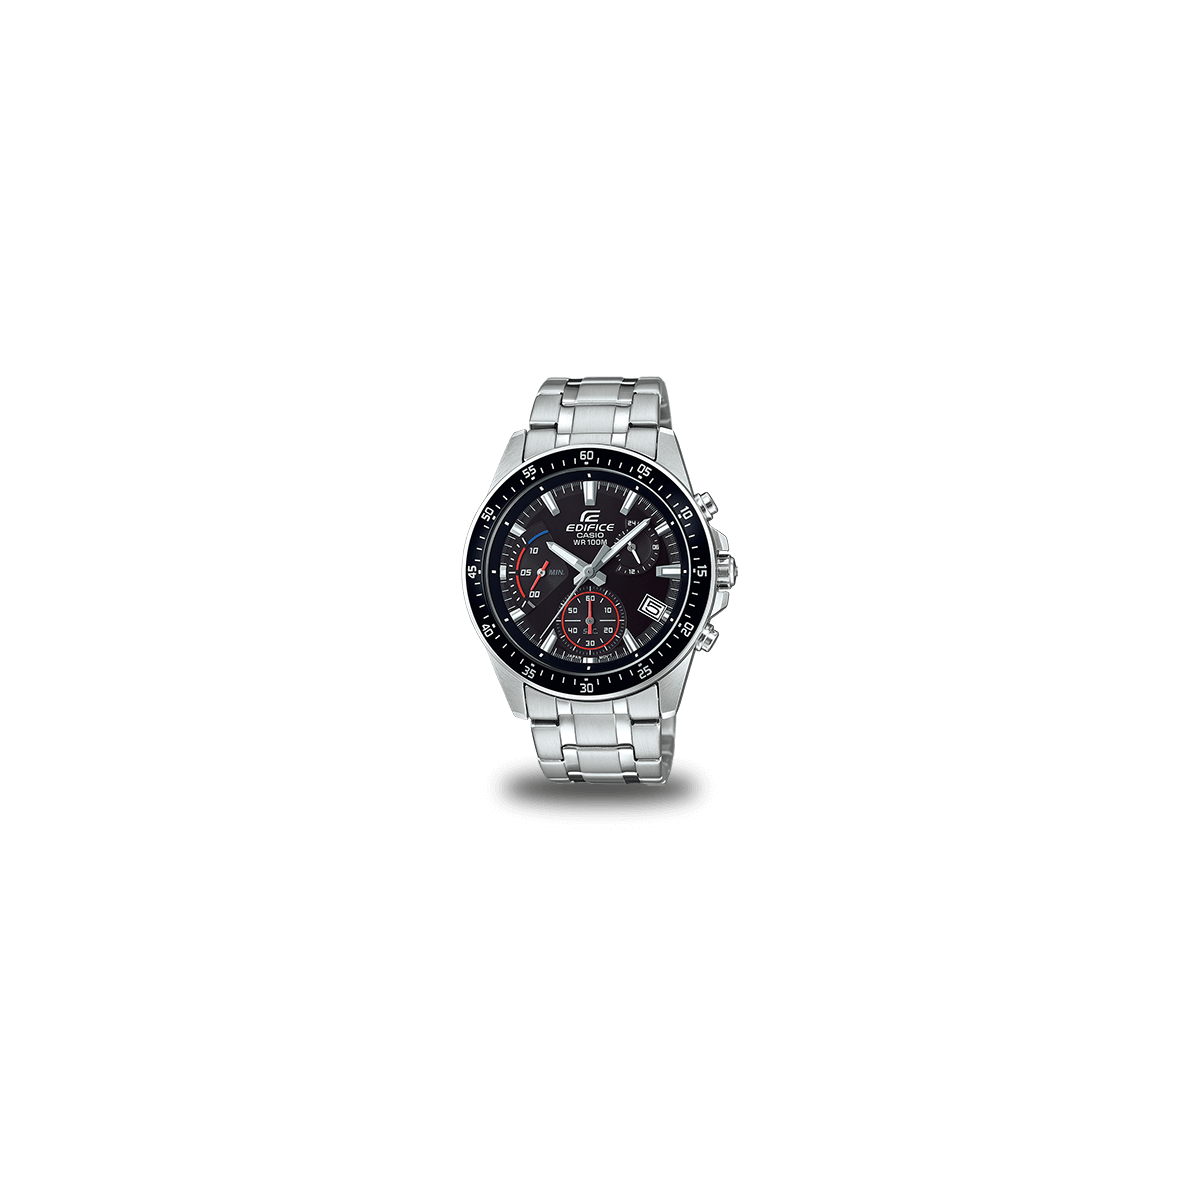 https://www.gaberjoyeria.com/4076-thickbox_default/reloj-casio-edifice.jpg